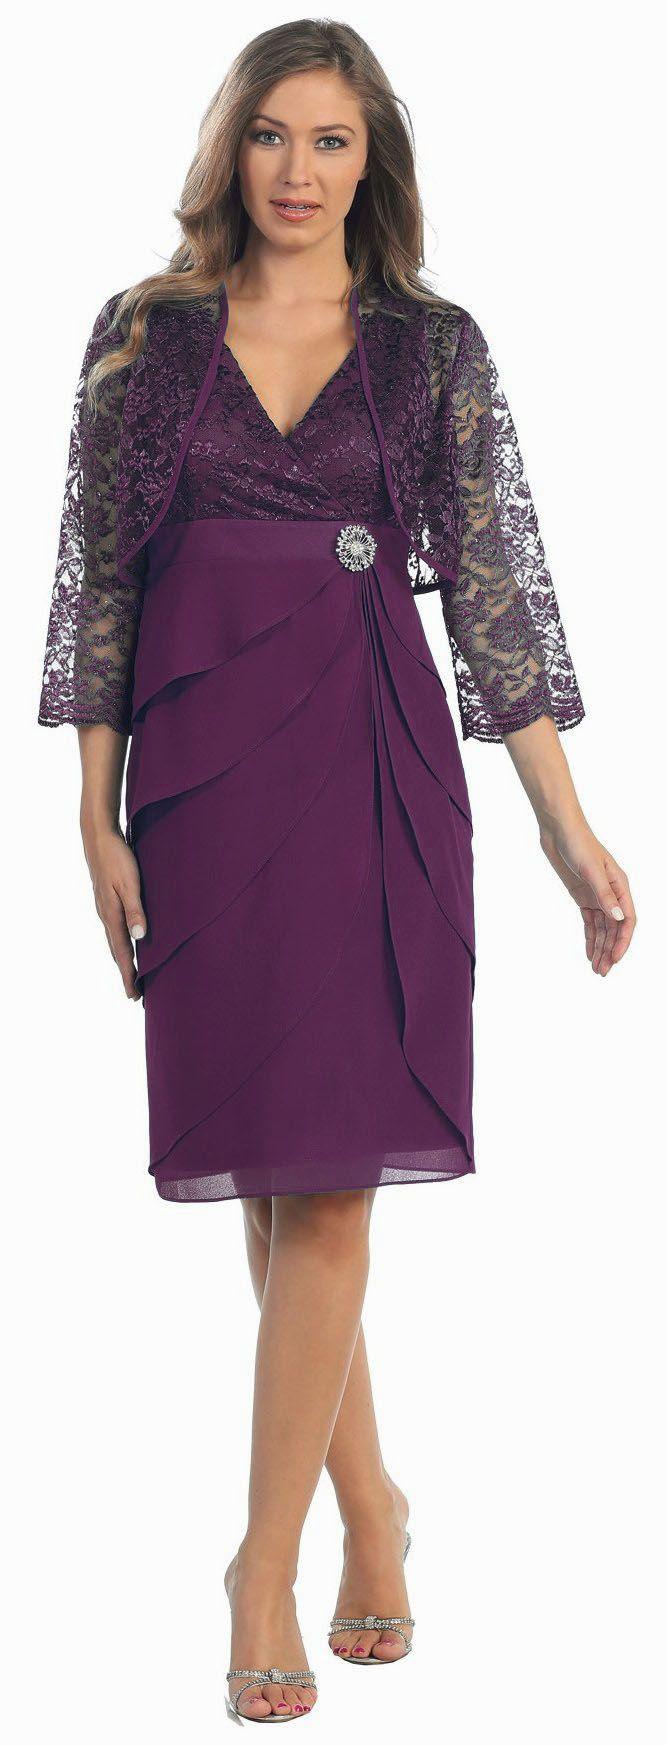 20 best clothes images on Pinterest | Dress plus sizes, Bridesmade ...